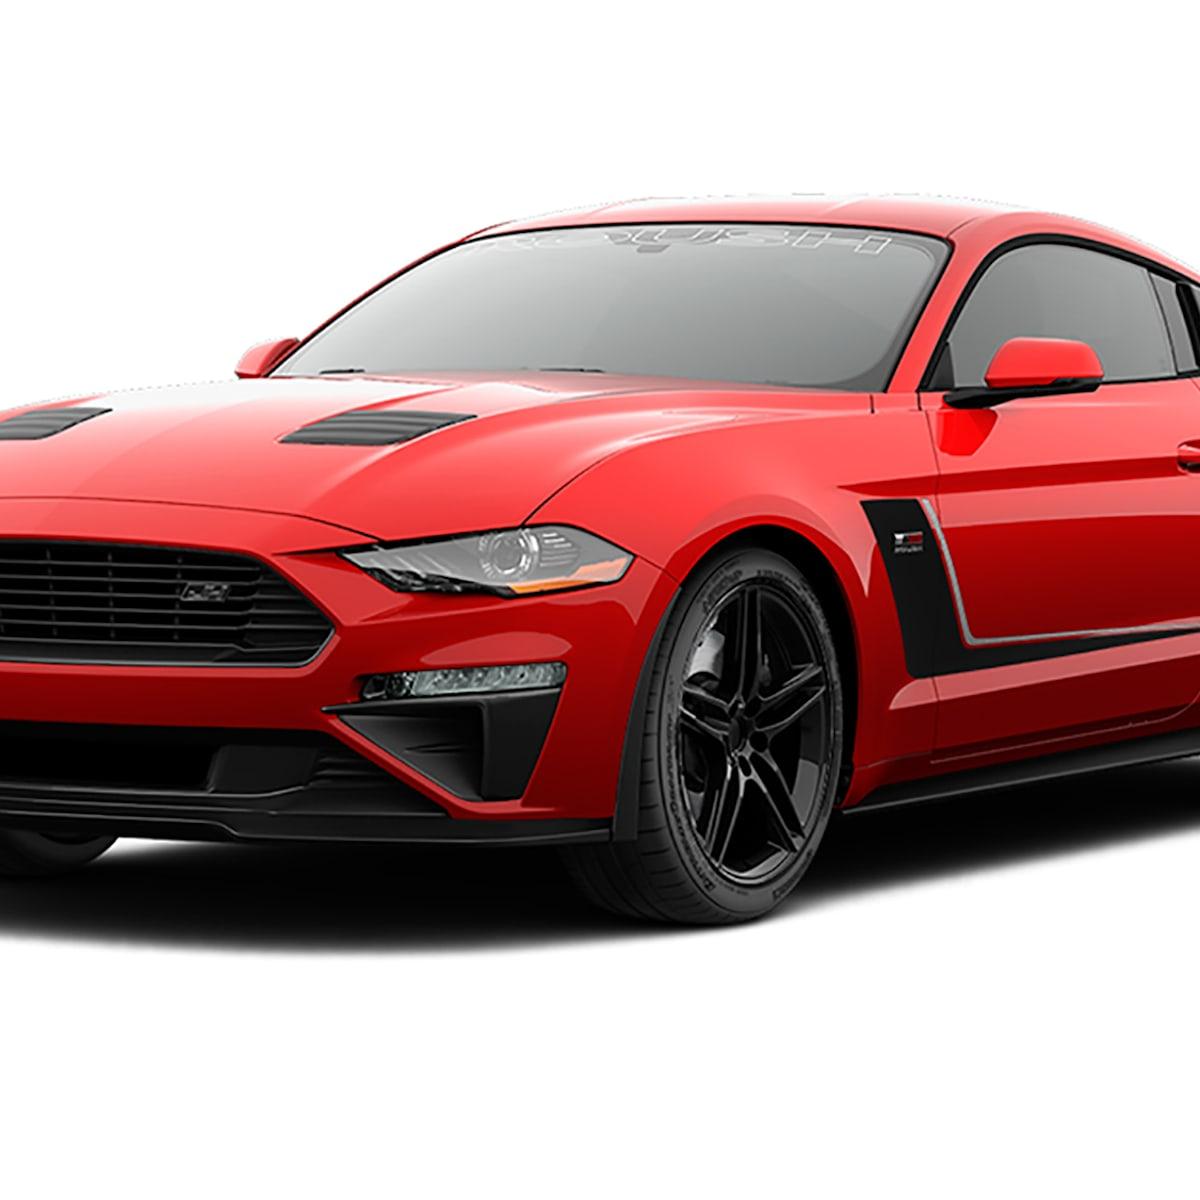 2018 Roush Jackhammer Mustang revealed - UPDATE | CarAdvice